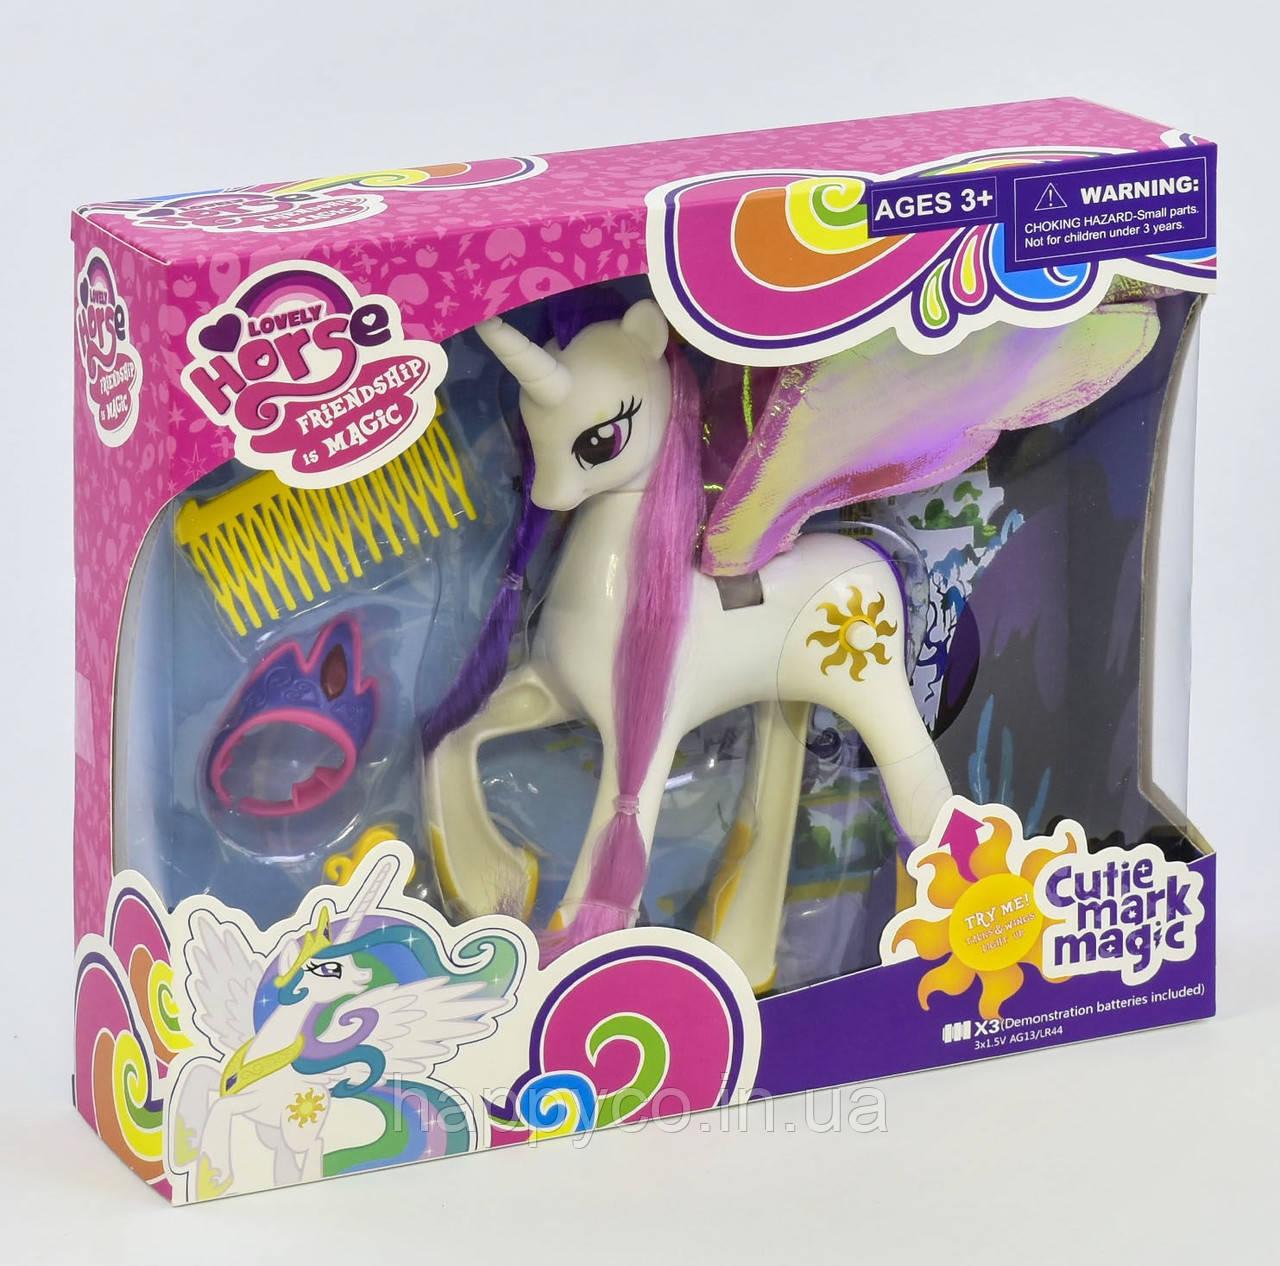 Пони  с аксессуарами, музыка, свет, в коробке , My little pony